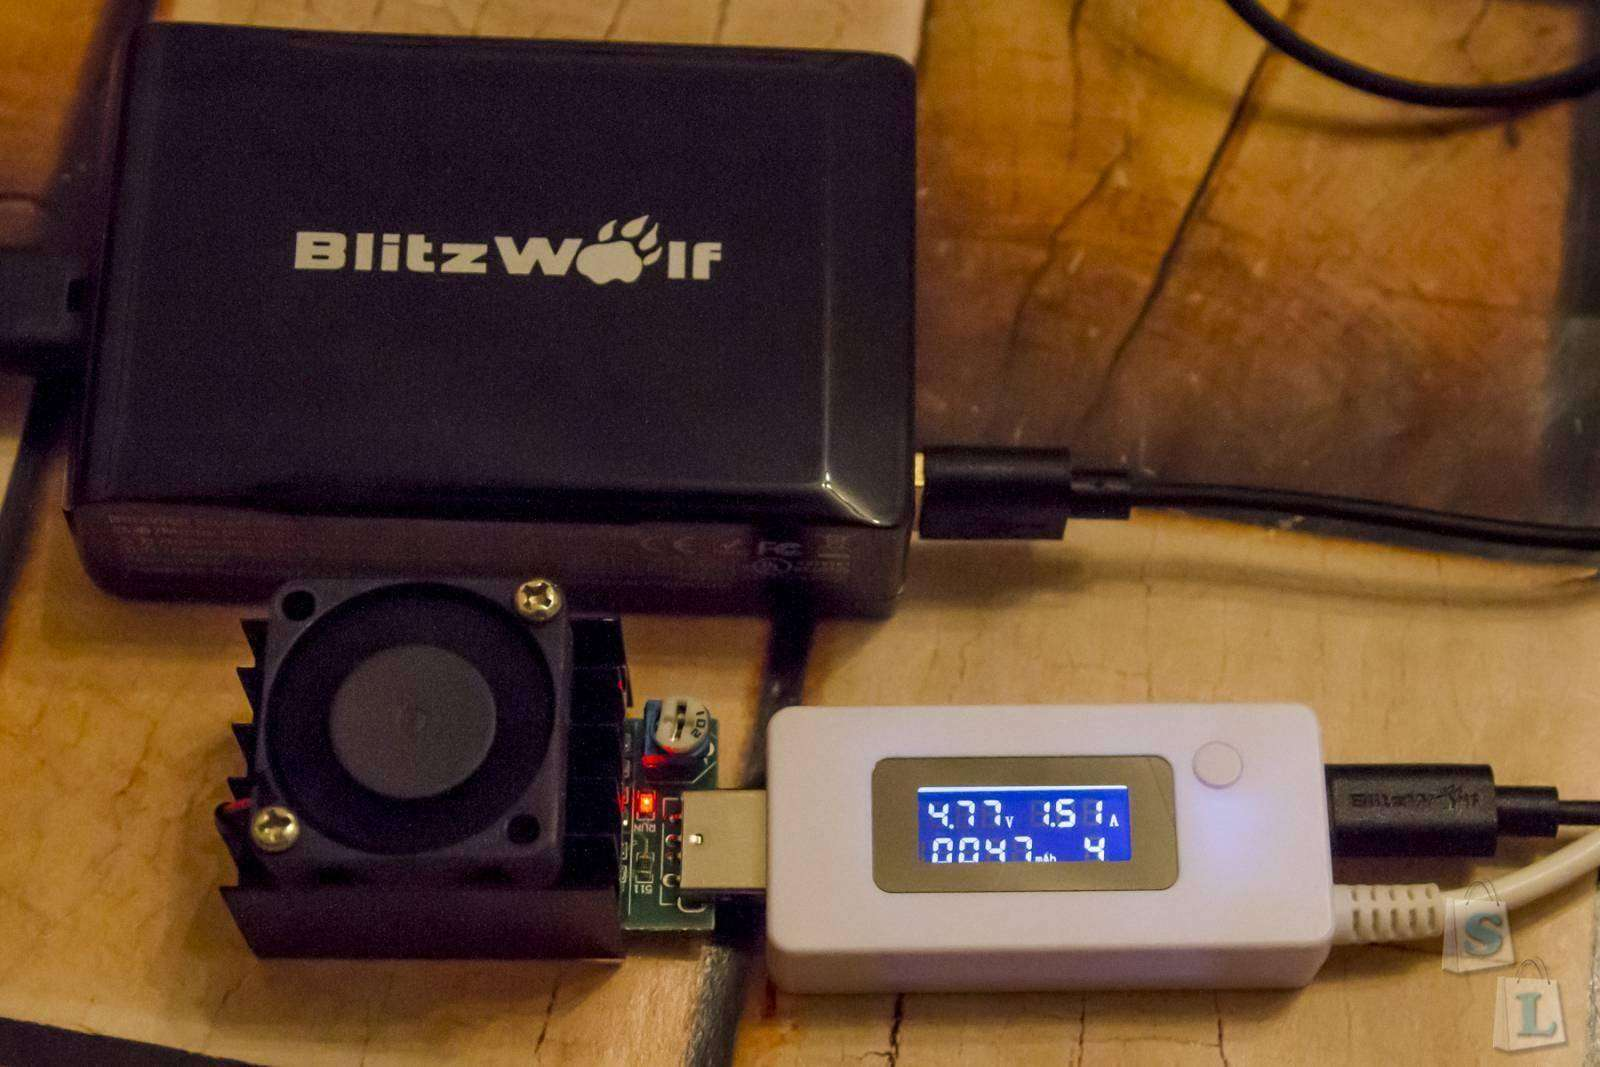 Banggood: Двухсторонние USB-micro USB кабели BlitzWolf